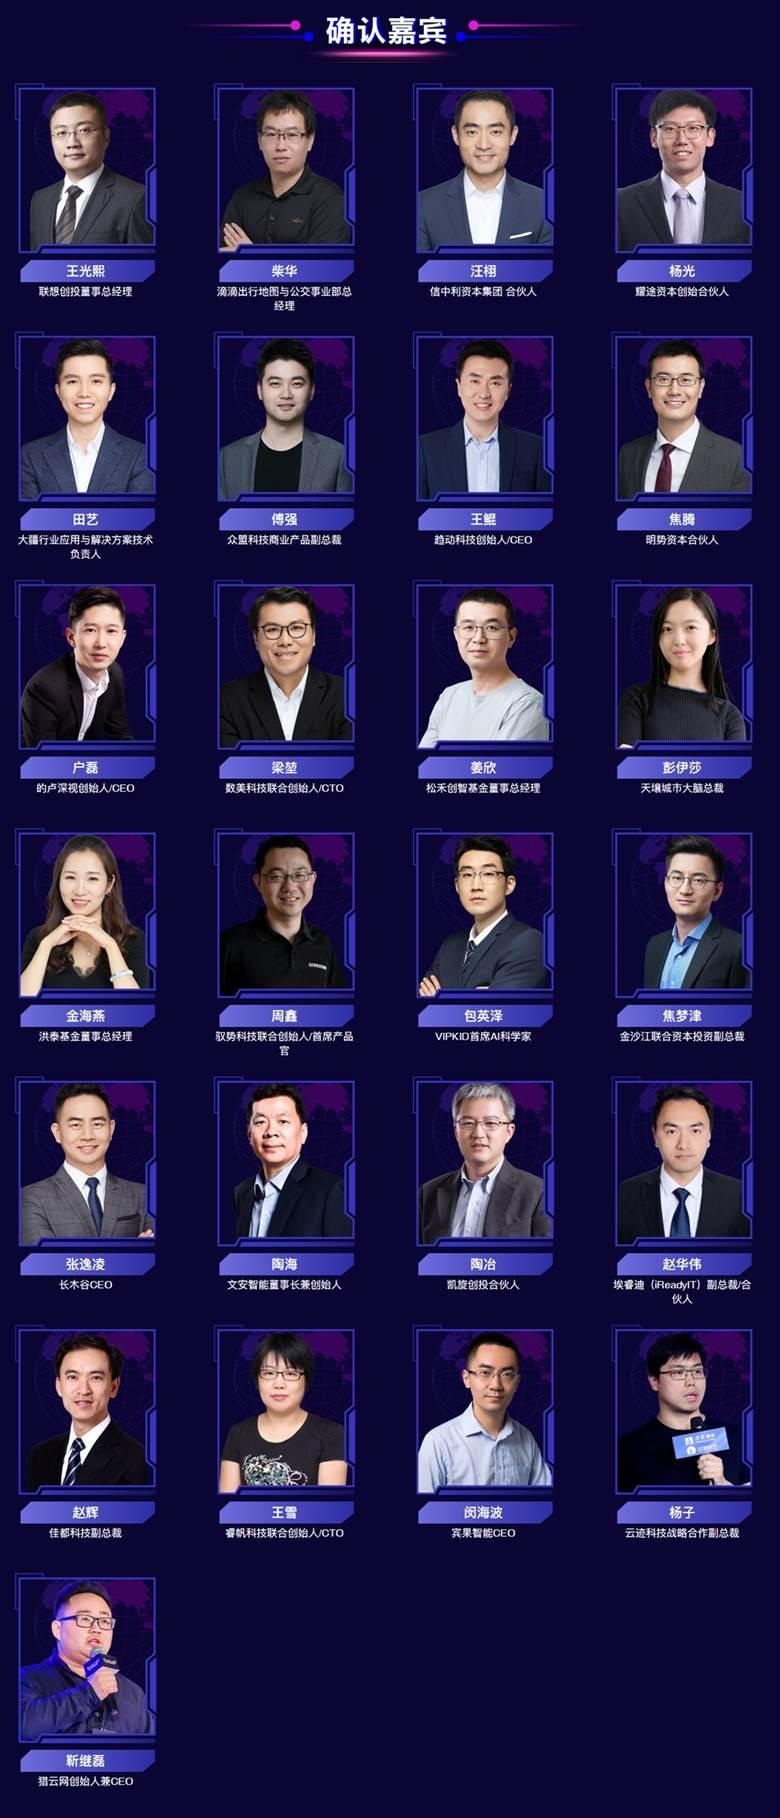 FUS-猎云网2020年度人工智能产业峰会_02.png